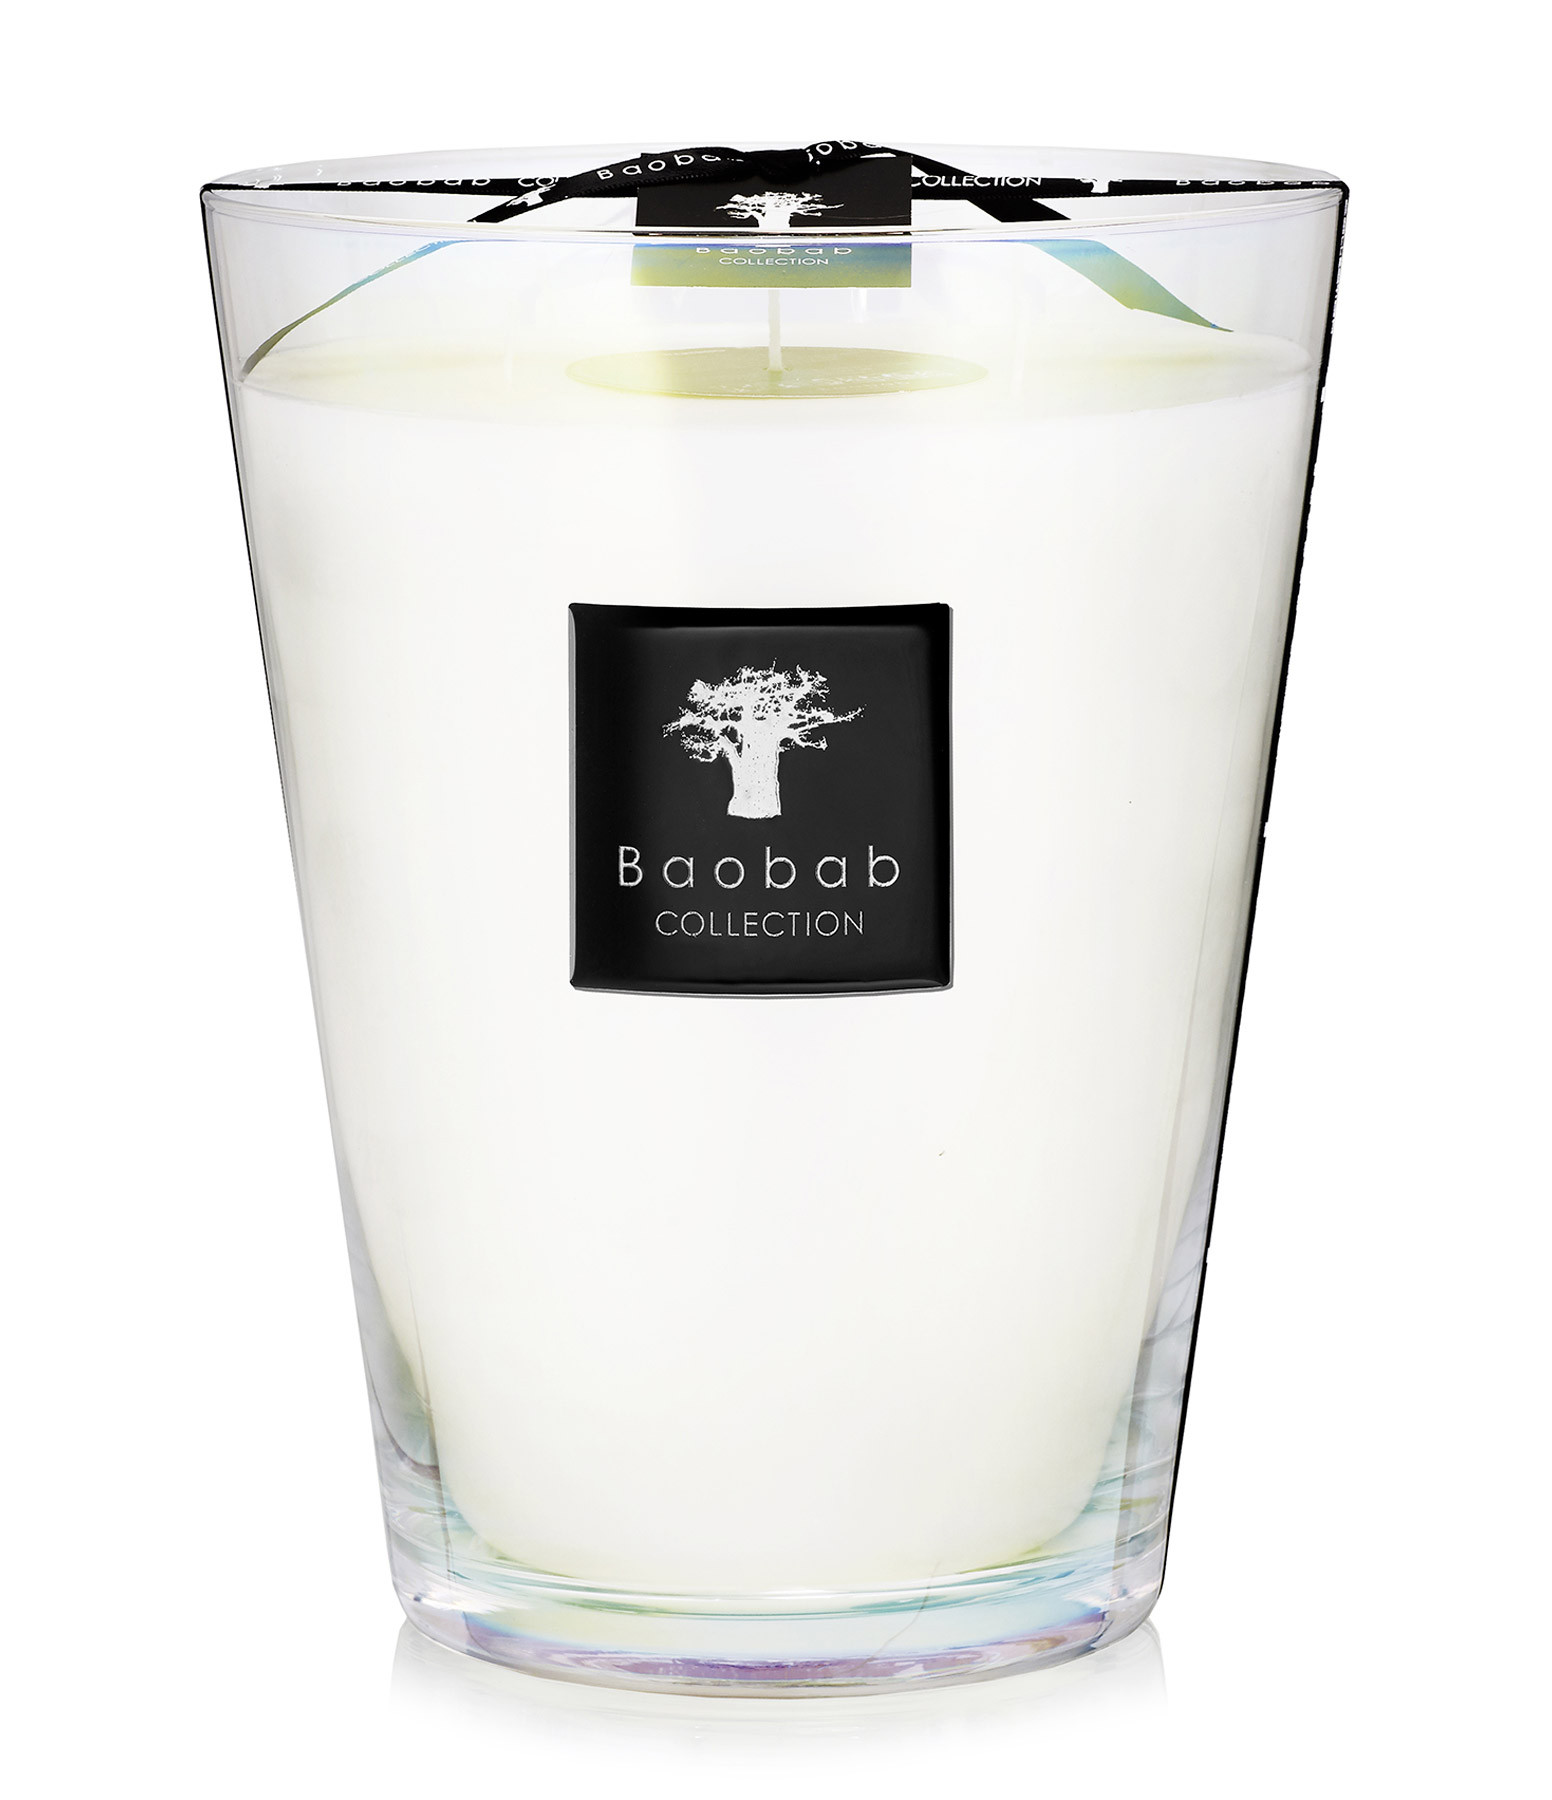 BAOBAB COLLECTION - Bougie Max 24 All Seasons Madagascar Vanilla